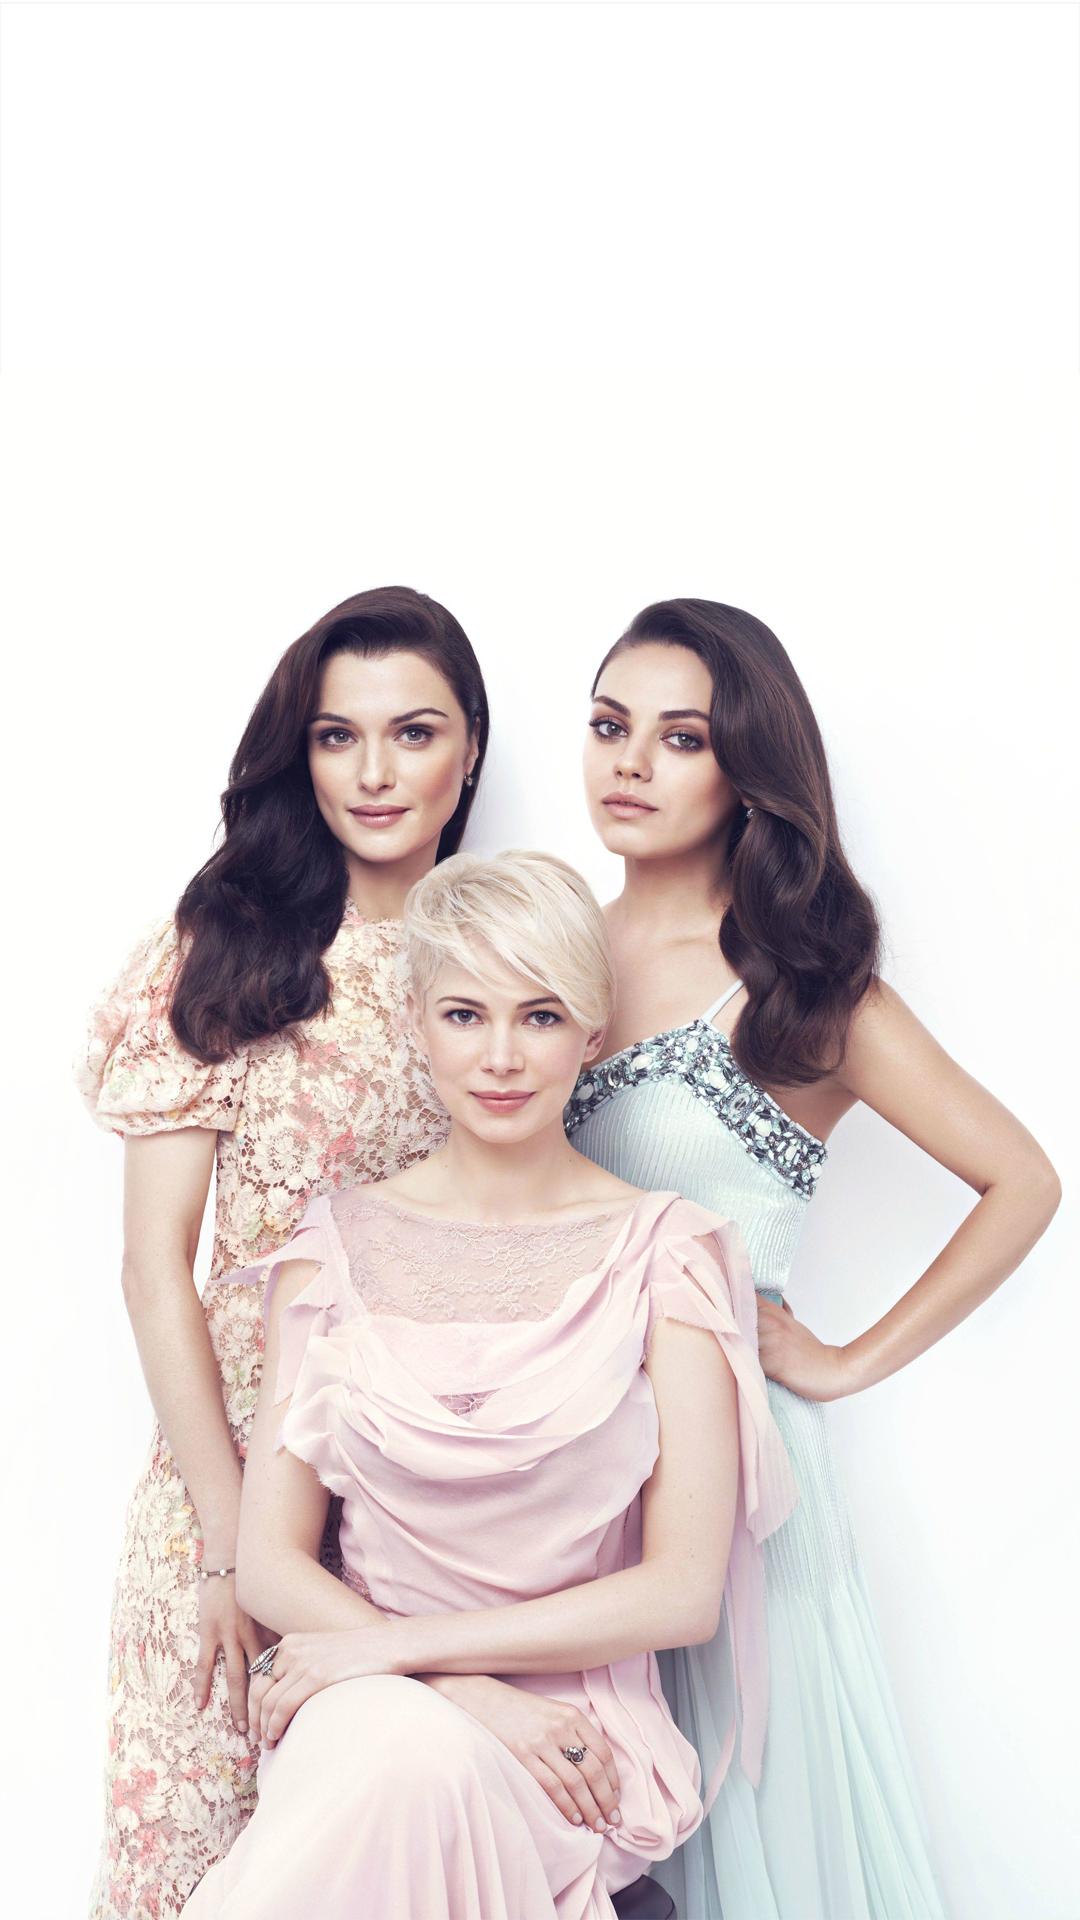 Mila Kunis, Michelle Williams & Rachel Weisz